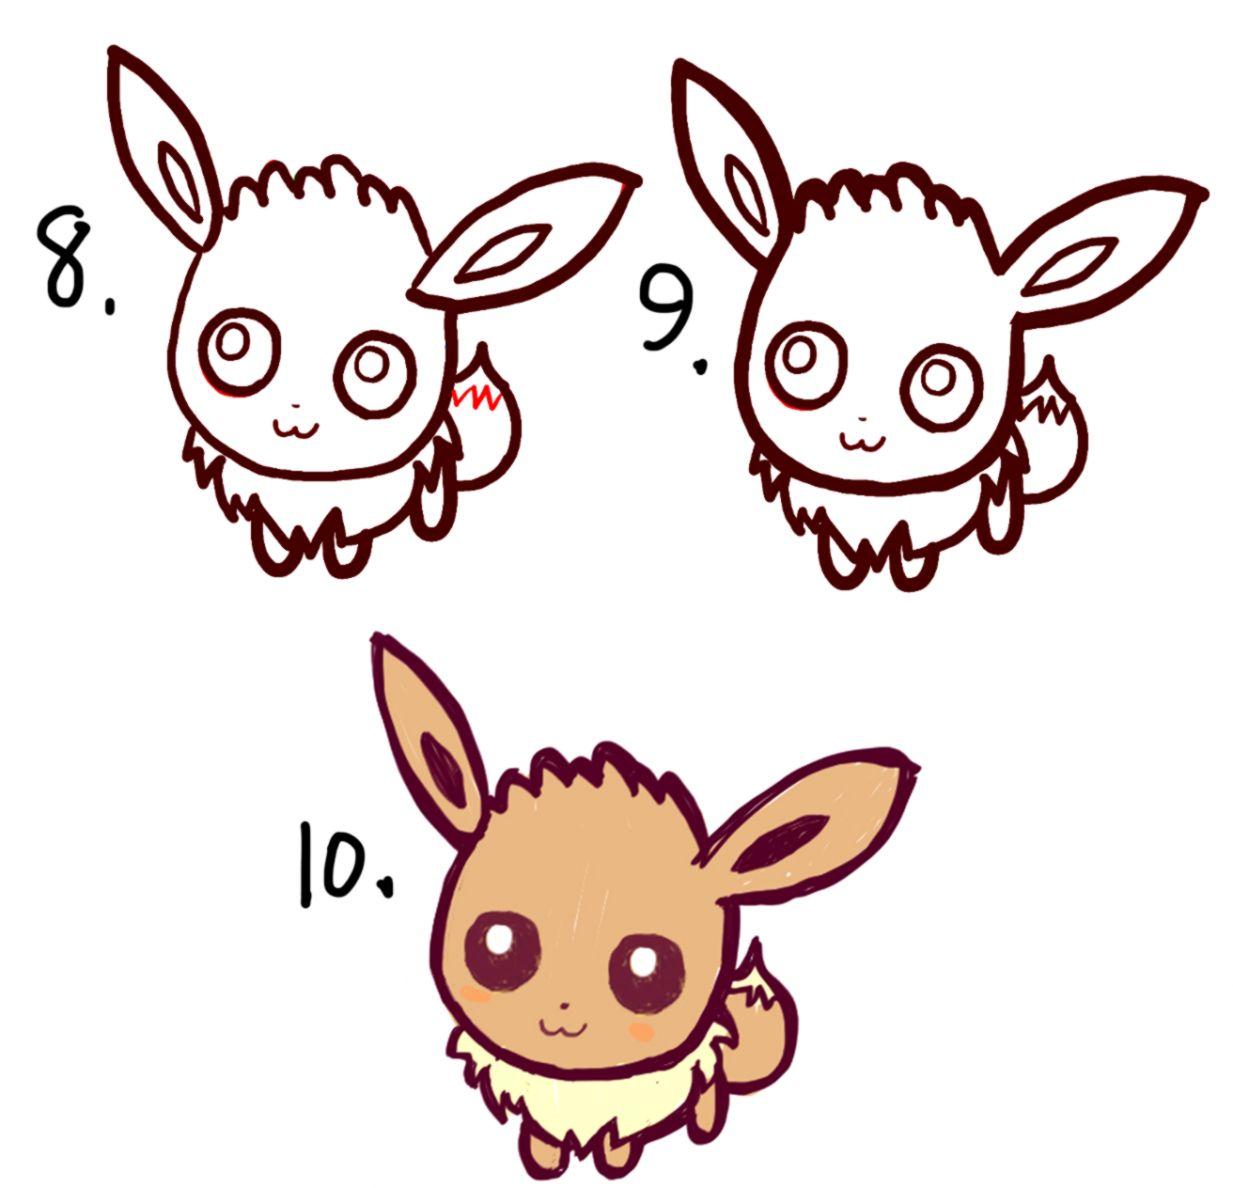 Cute Chibi Animal Drawings Kingdom Wallpapers